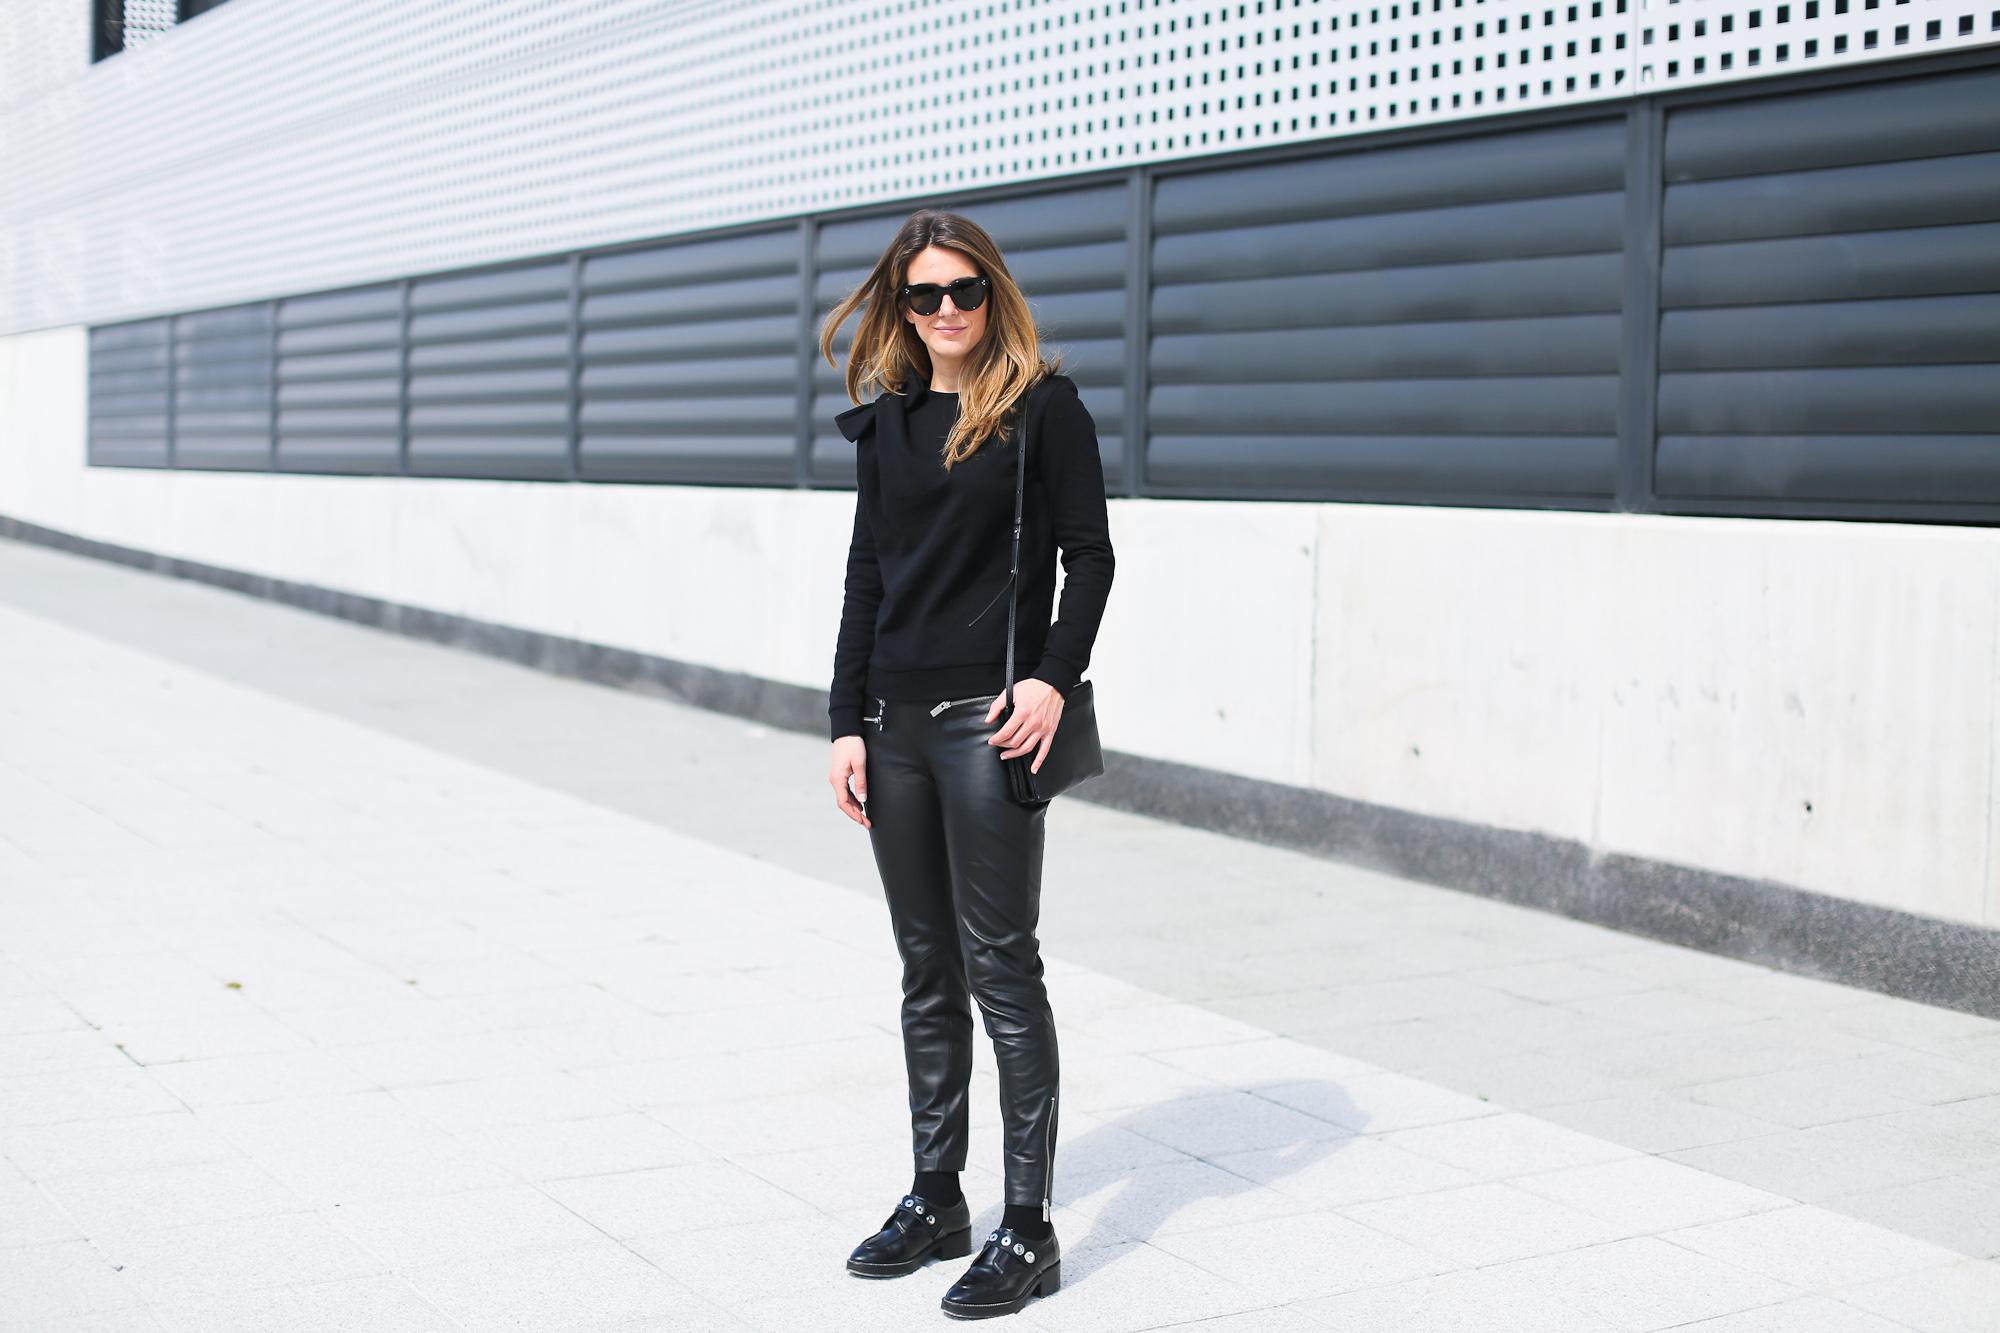 Clochet_streetstyle_pantalones_piel_suiteblanco_zapatos_planos_sandro-10